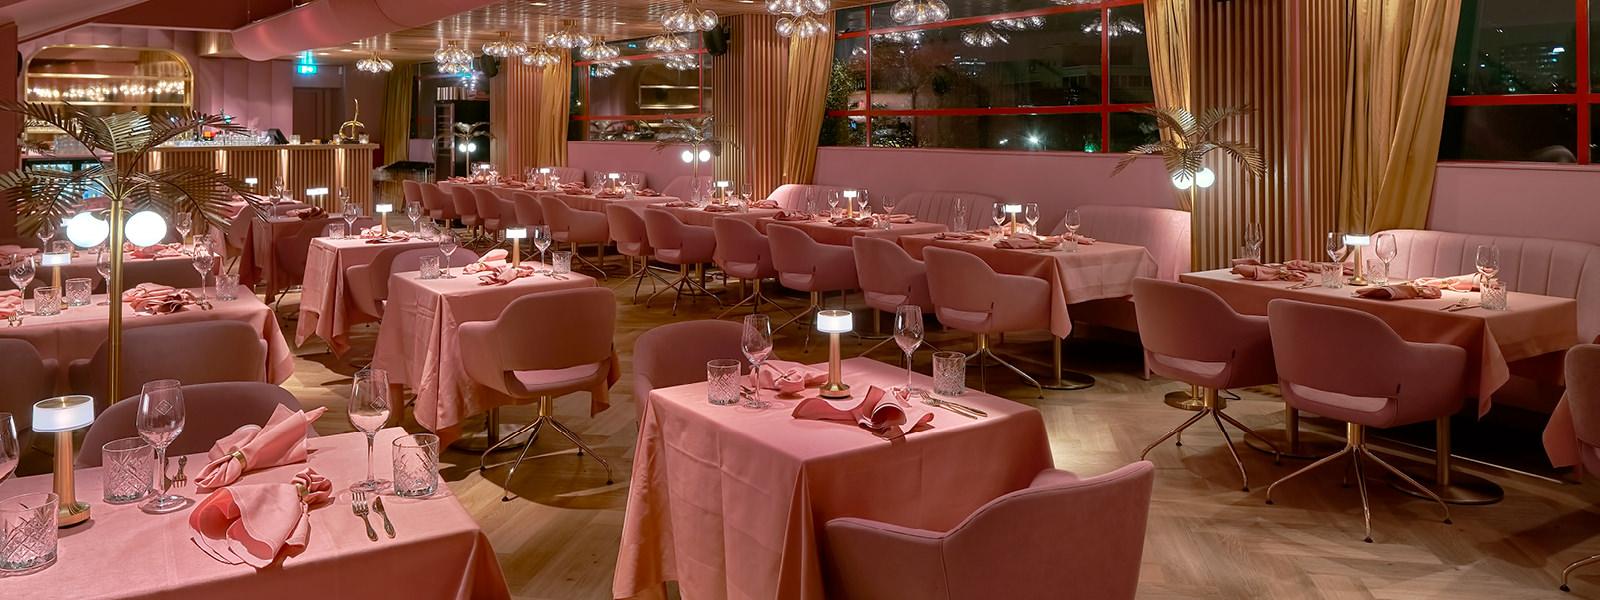 15 Most Instagrammable Restaurants Of Amsterdam Anne Travel Foodie